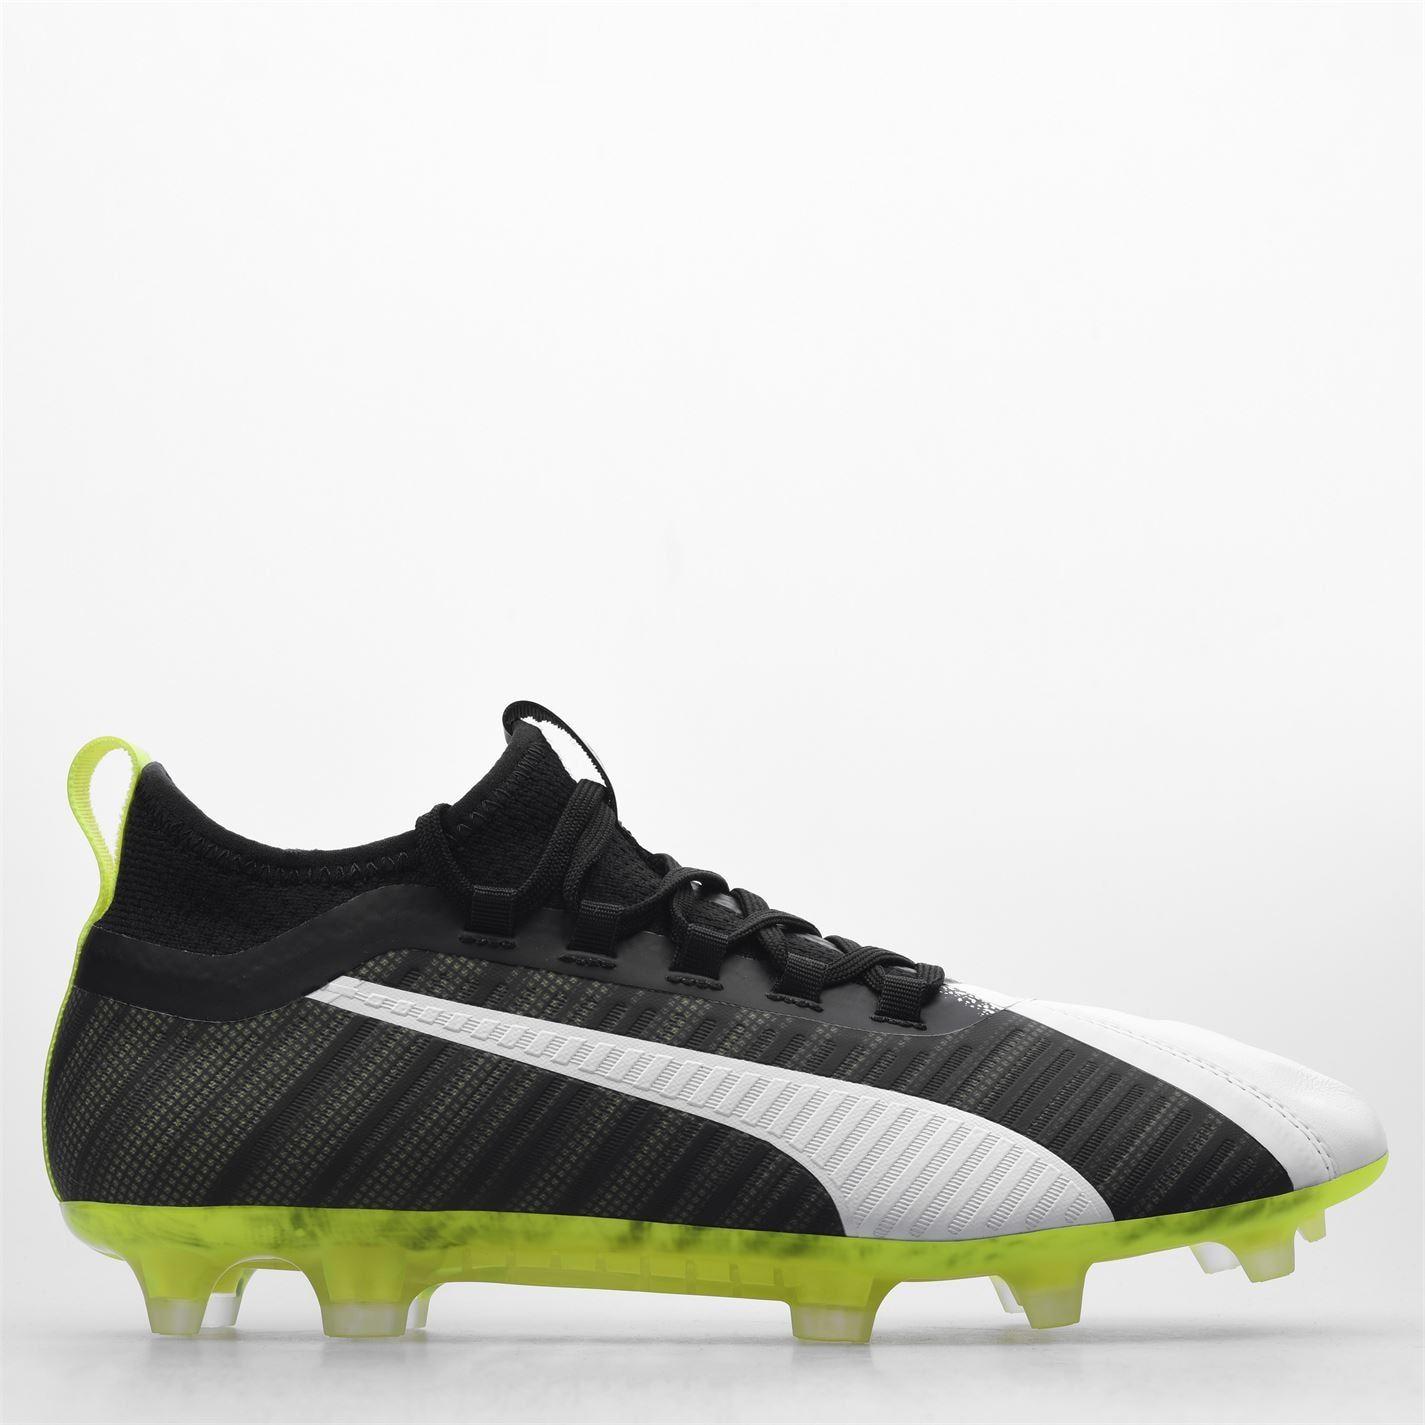 miniature 11 - Puma-5-2-FG-Firm-Ground-Football-Bottes-Homme-Chaussures-De-Foot-Crampons-Baskets